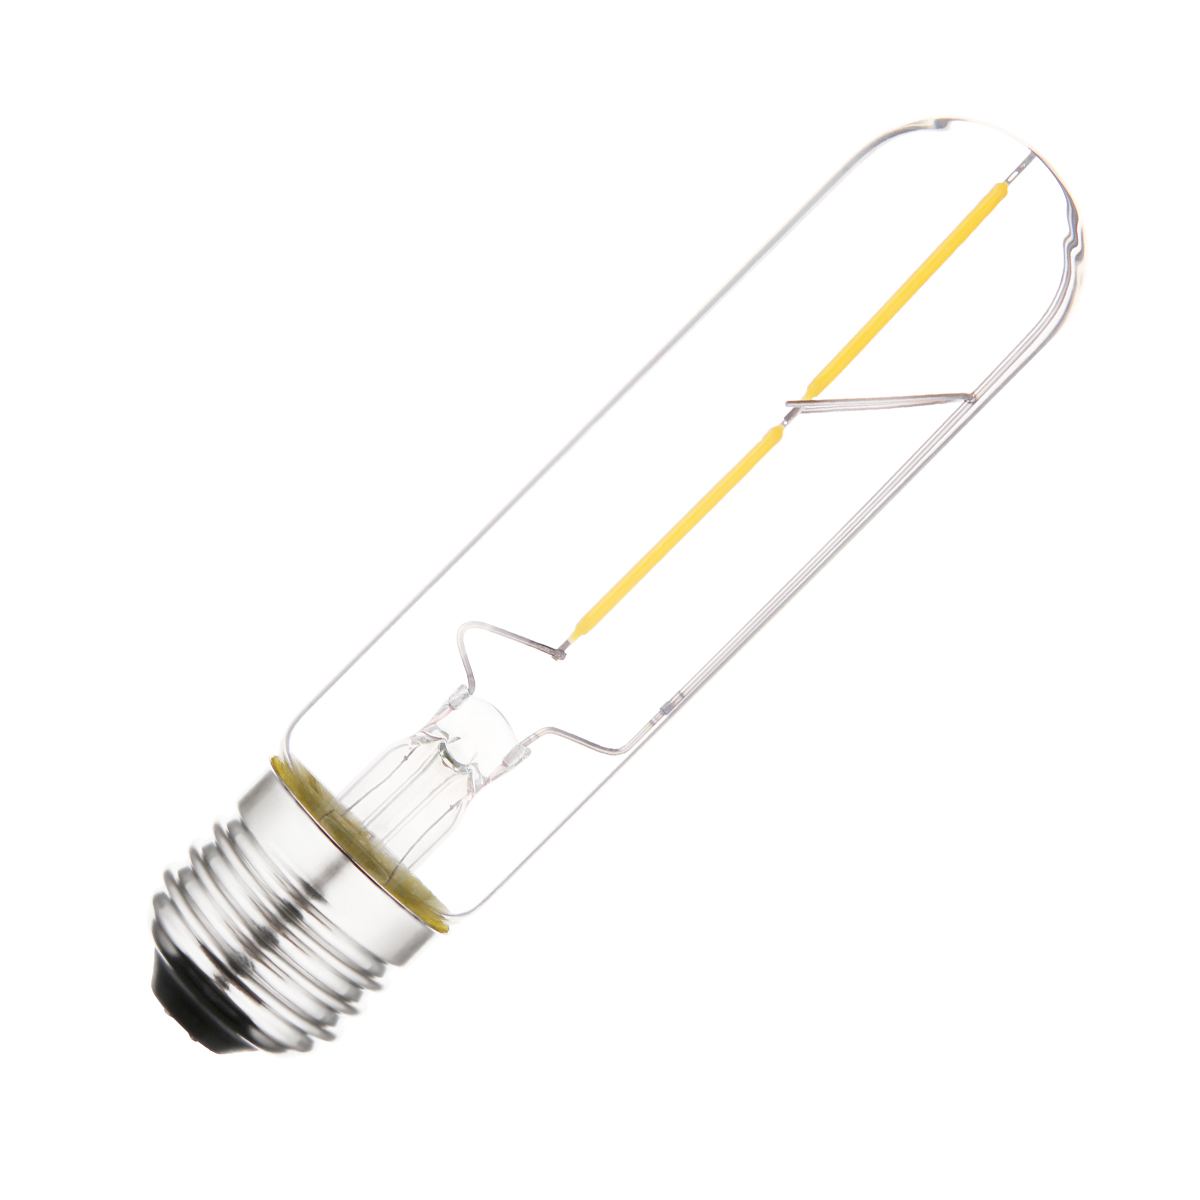 T10 E27 1 8w Warm White 200lm Cob Led Bulb Filament Retro